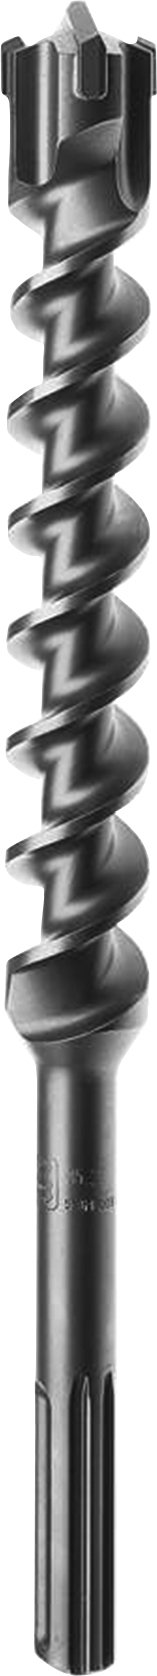 B-20080 Drill Bit Sds-Max ''Nemesis'' 24mmx12.6In